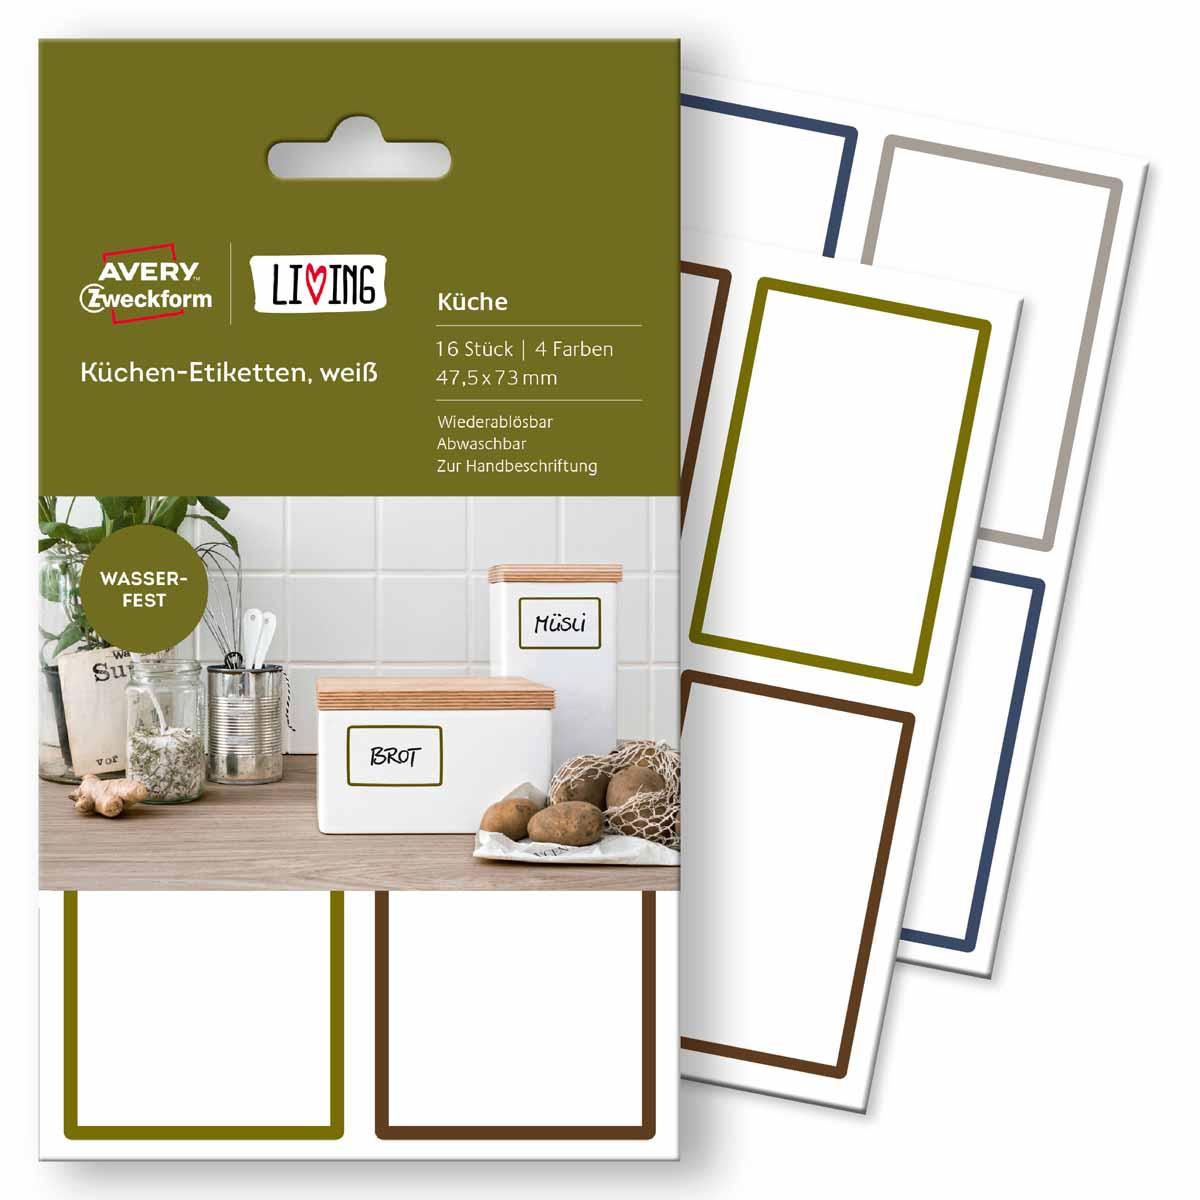 Avery Zweckform Этикетки для кухни Living 47,5 х 73 мм avery zweckform этикетки самоклеящиеся европа 100 52 5 х 29 7 мм 18 листов